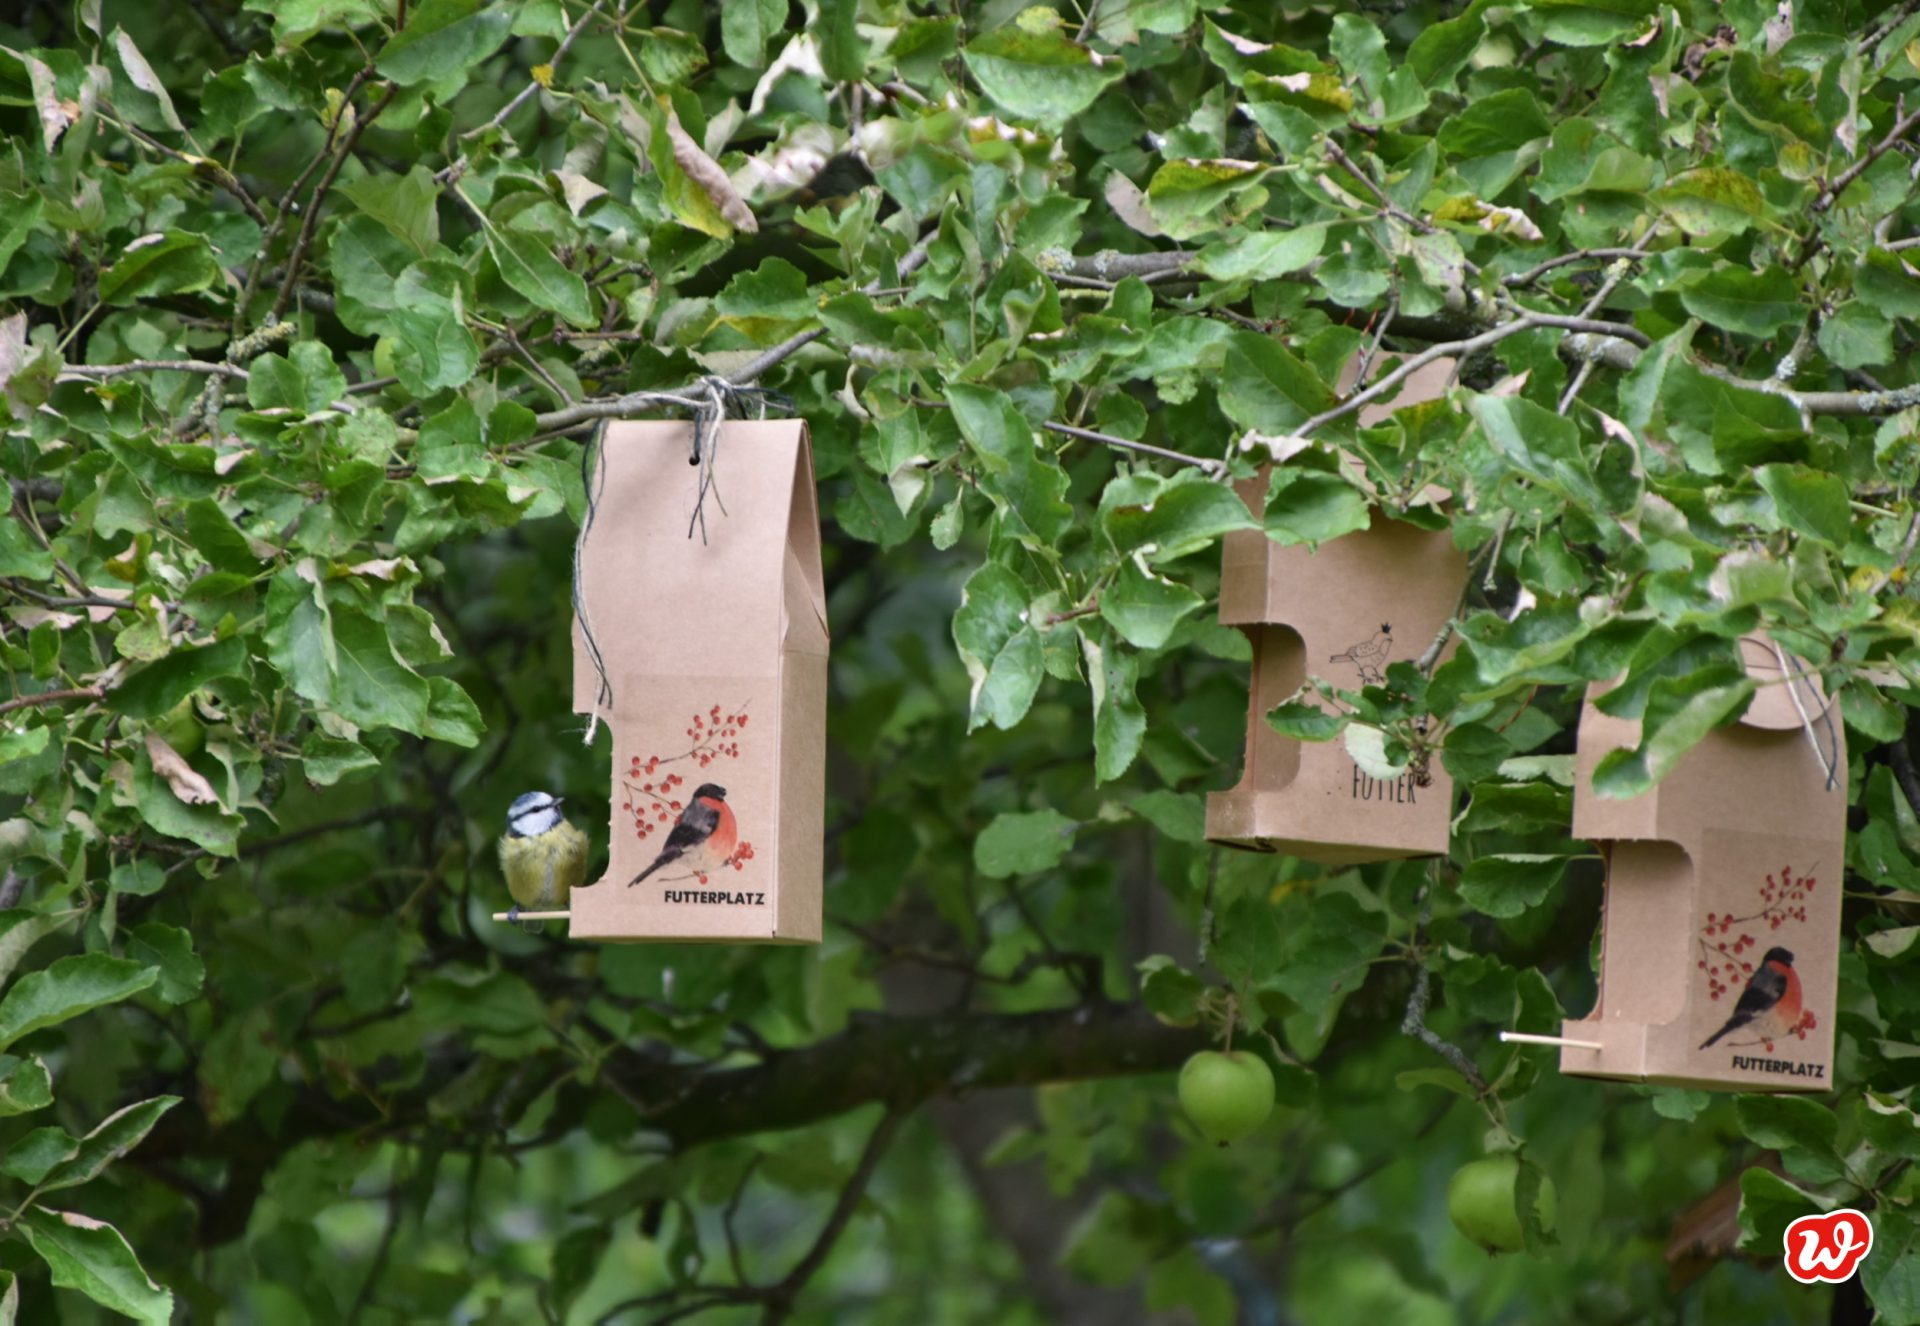 Wunderle Wildvogel Futterhaus mit Meise